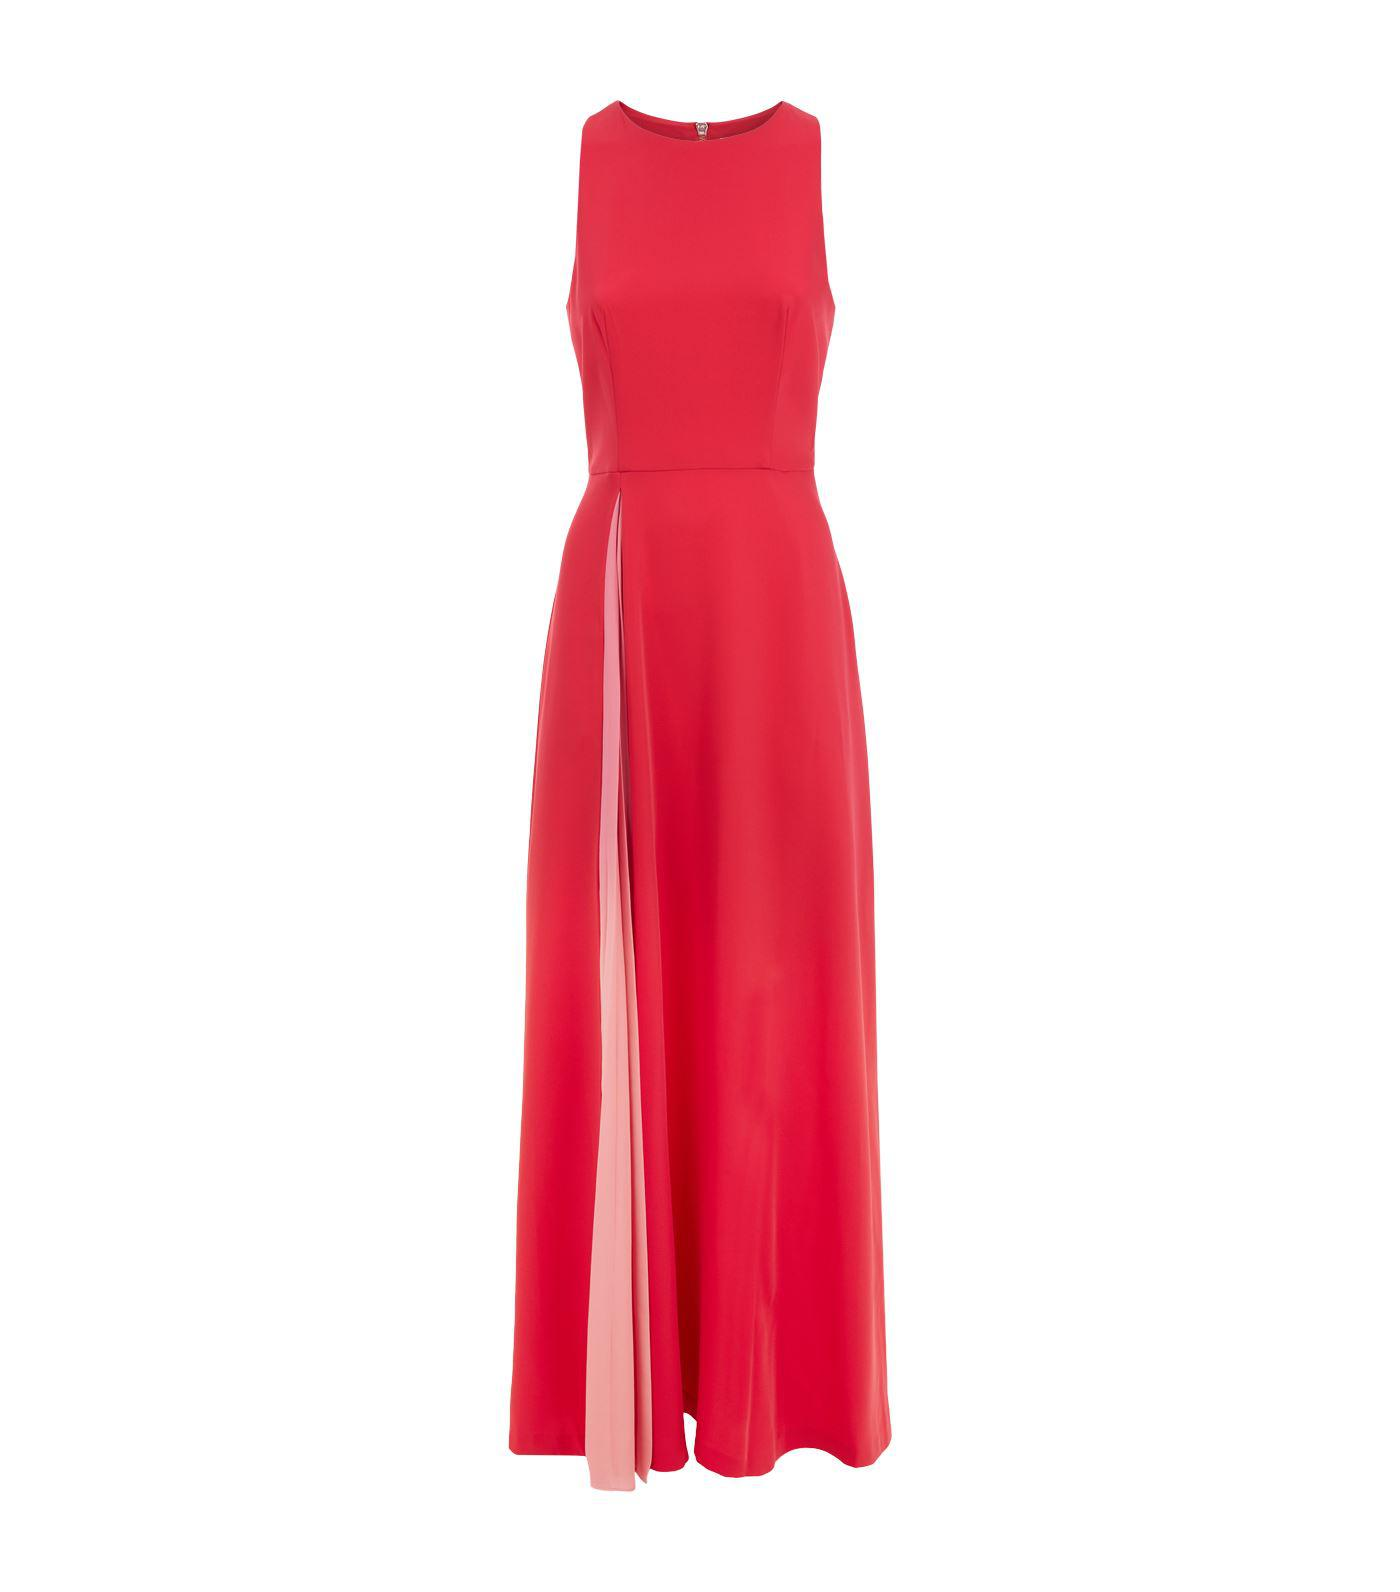 1fbd83132b9ef4 Ted Baker Madizon Contrast Pleat Maxi Dress in Pink - Lyst